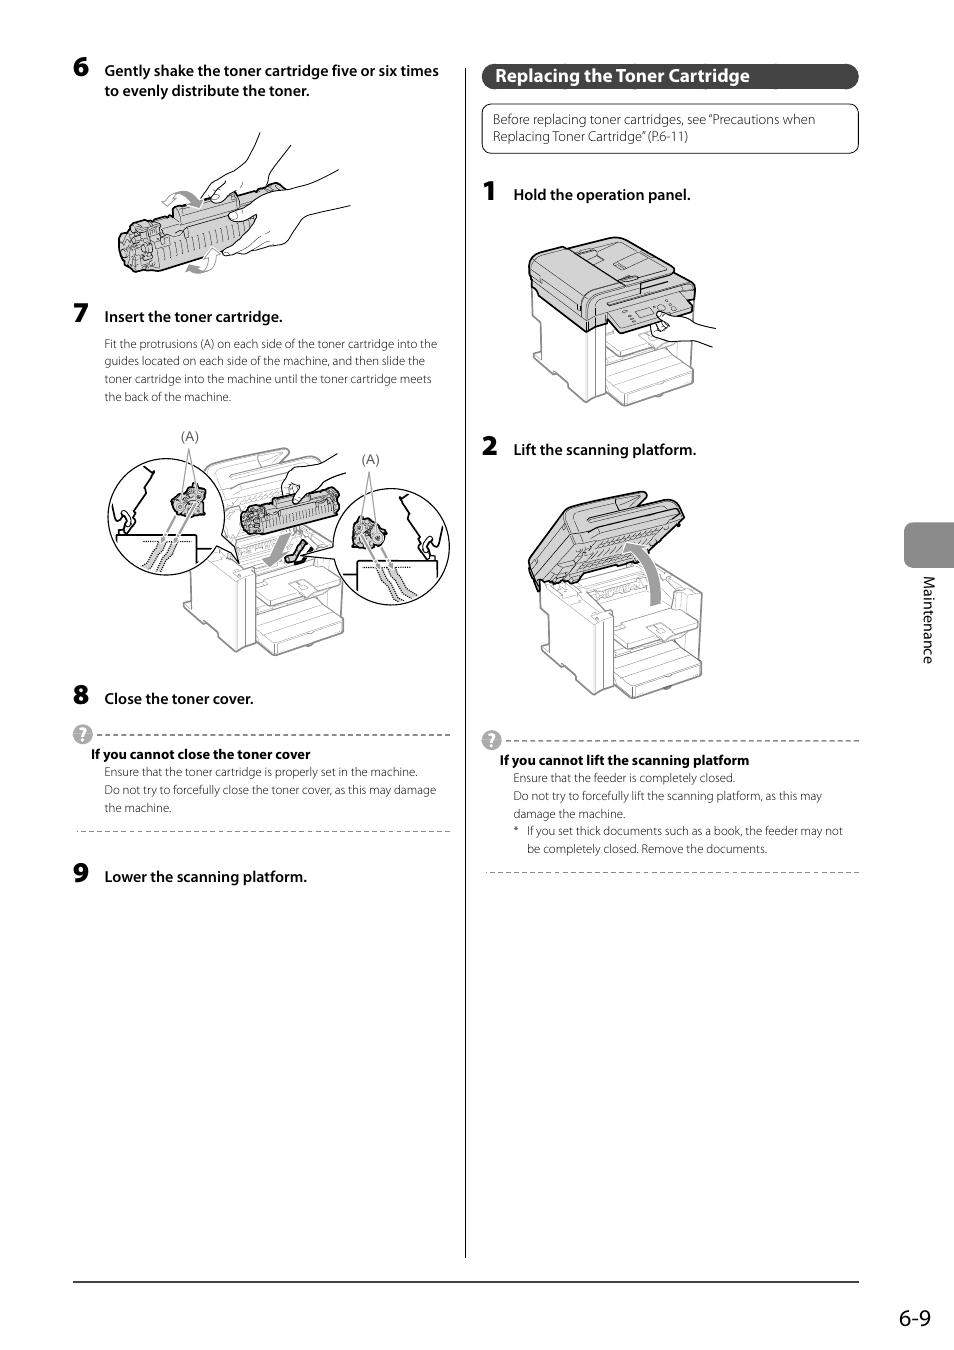 Replacing The Toner Cartridge Canon Imageclass D550 User Manual